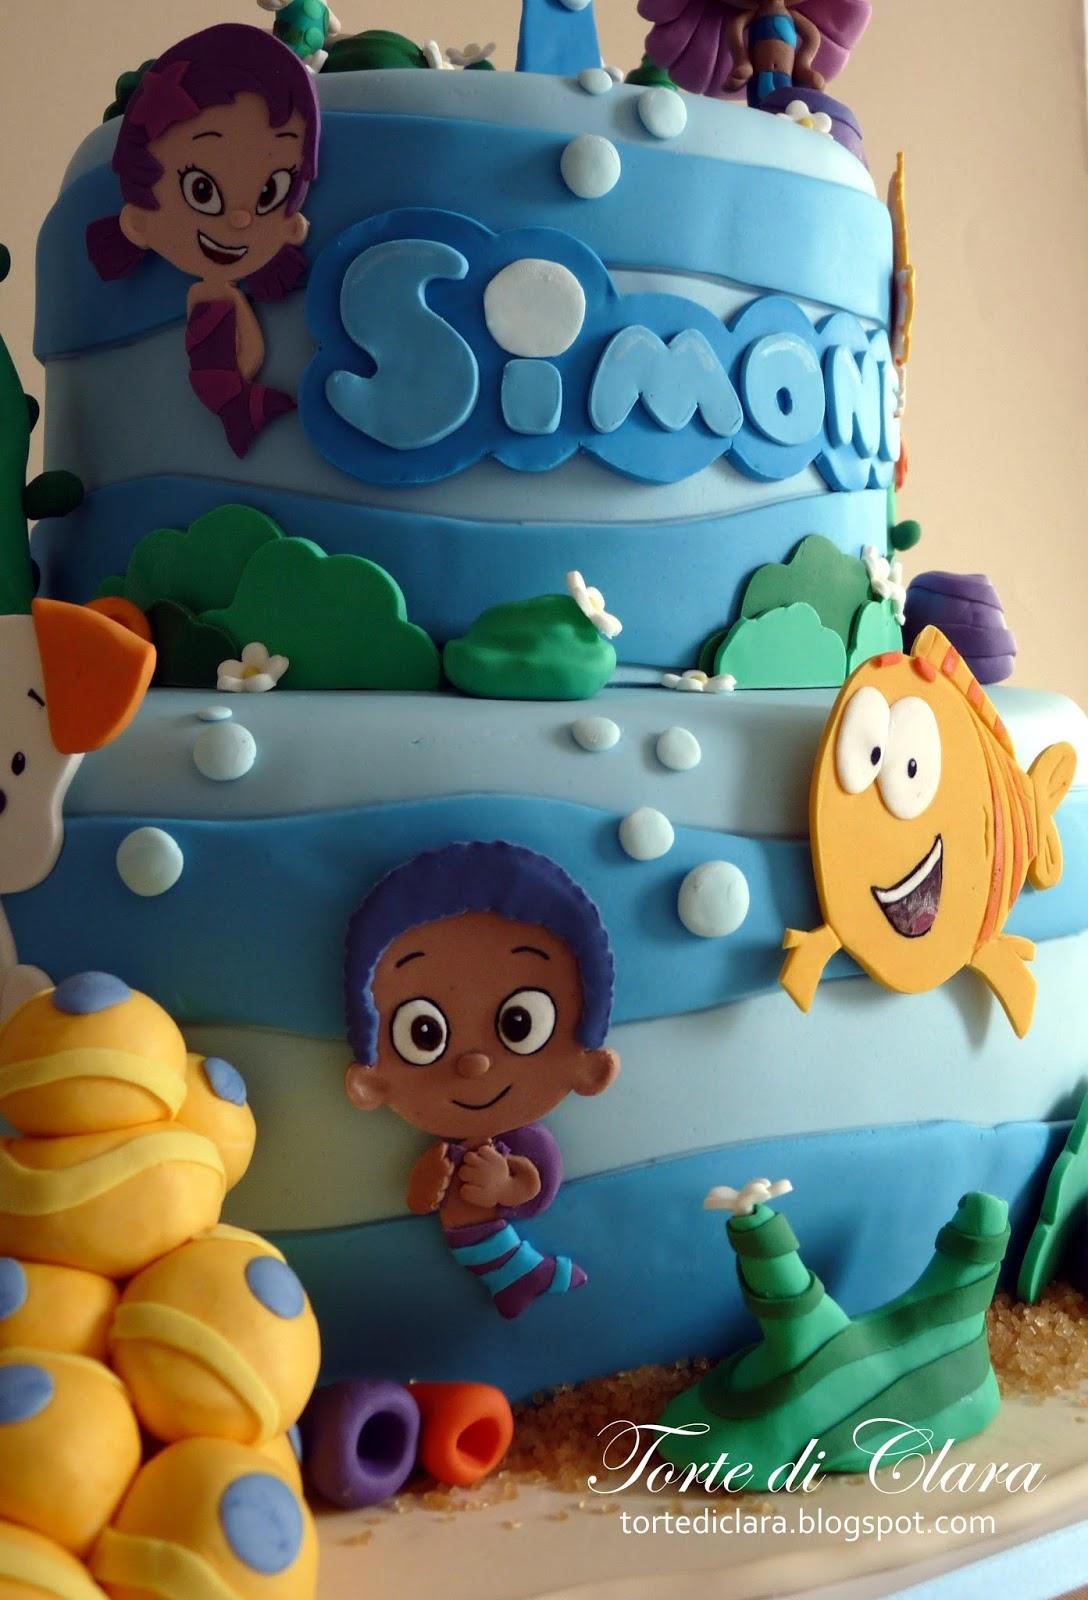 Bubble Guppies Winx Cake Ideas And Designs